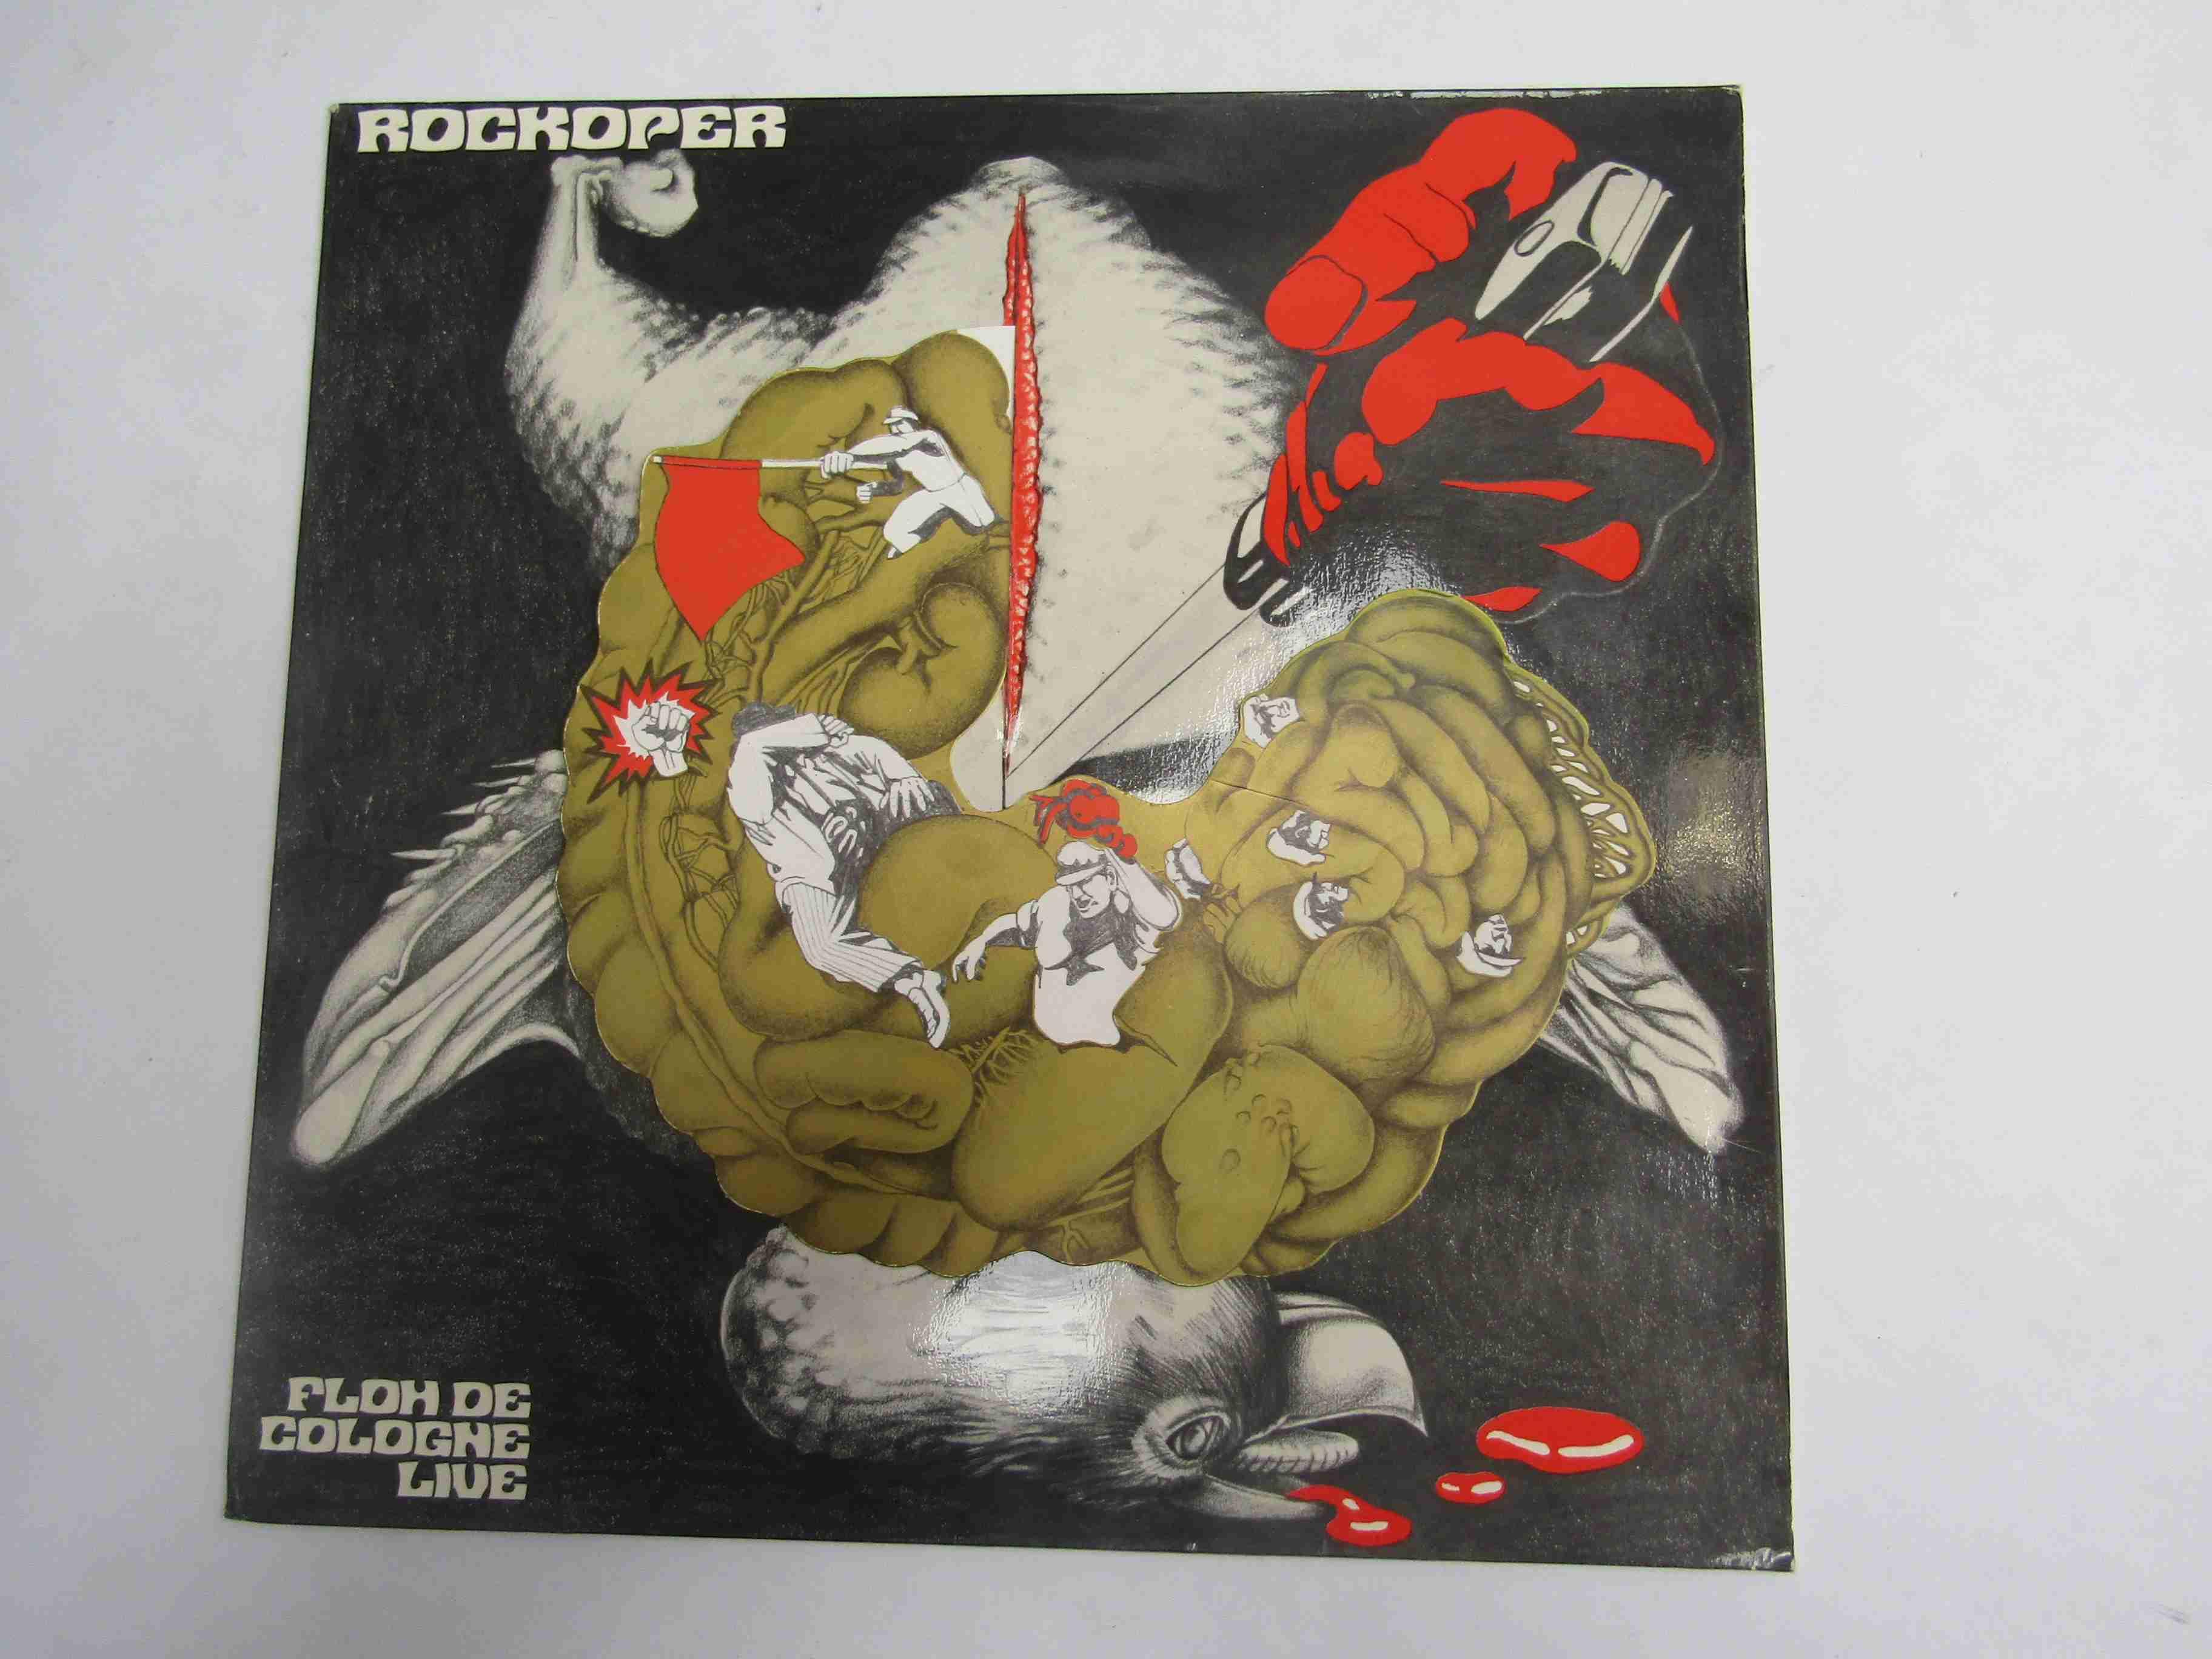 FLOH DE COLOGNE: 'Rockoper Profitgeier' LP on pink vinyl, Ohr OMM 556010 (media VG+/EX, - Image 2 of 2